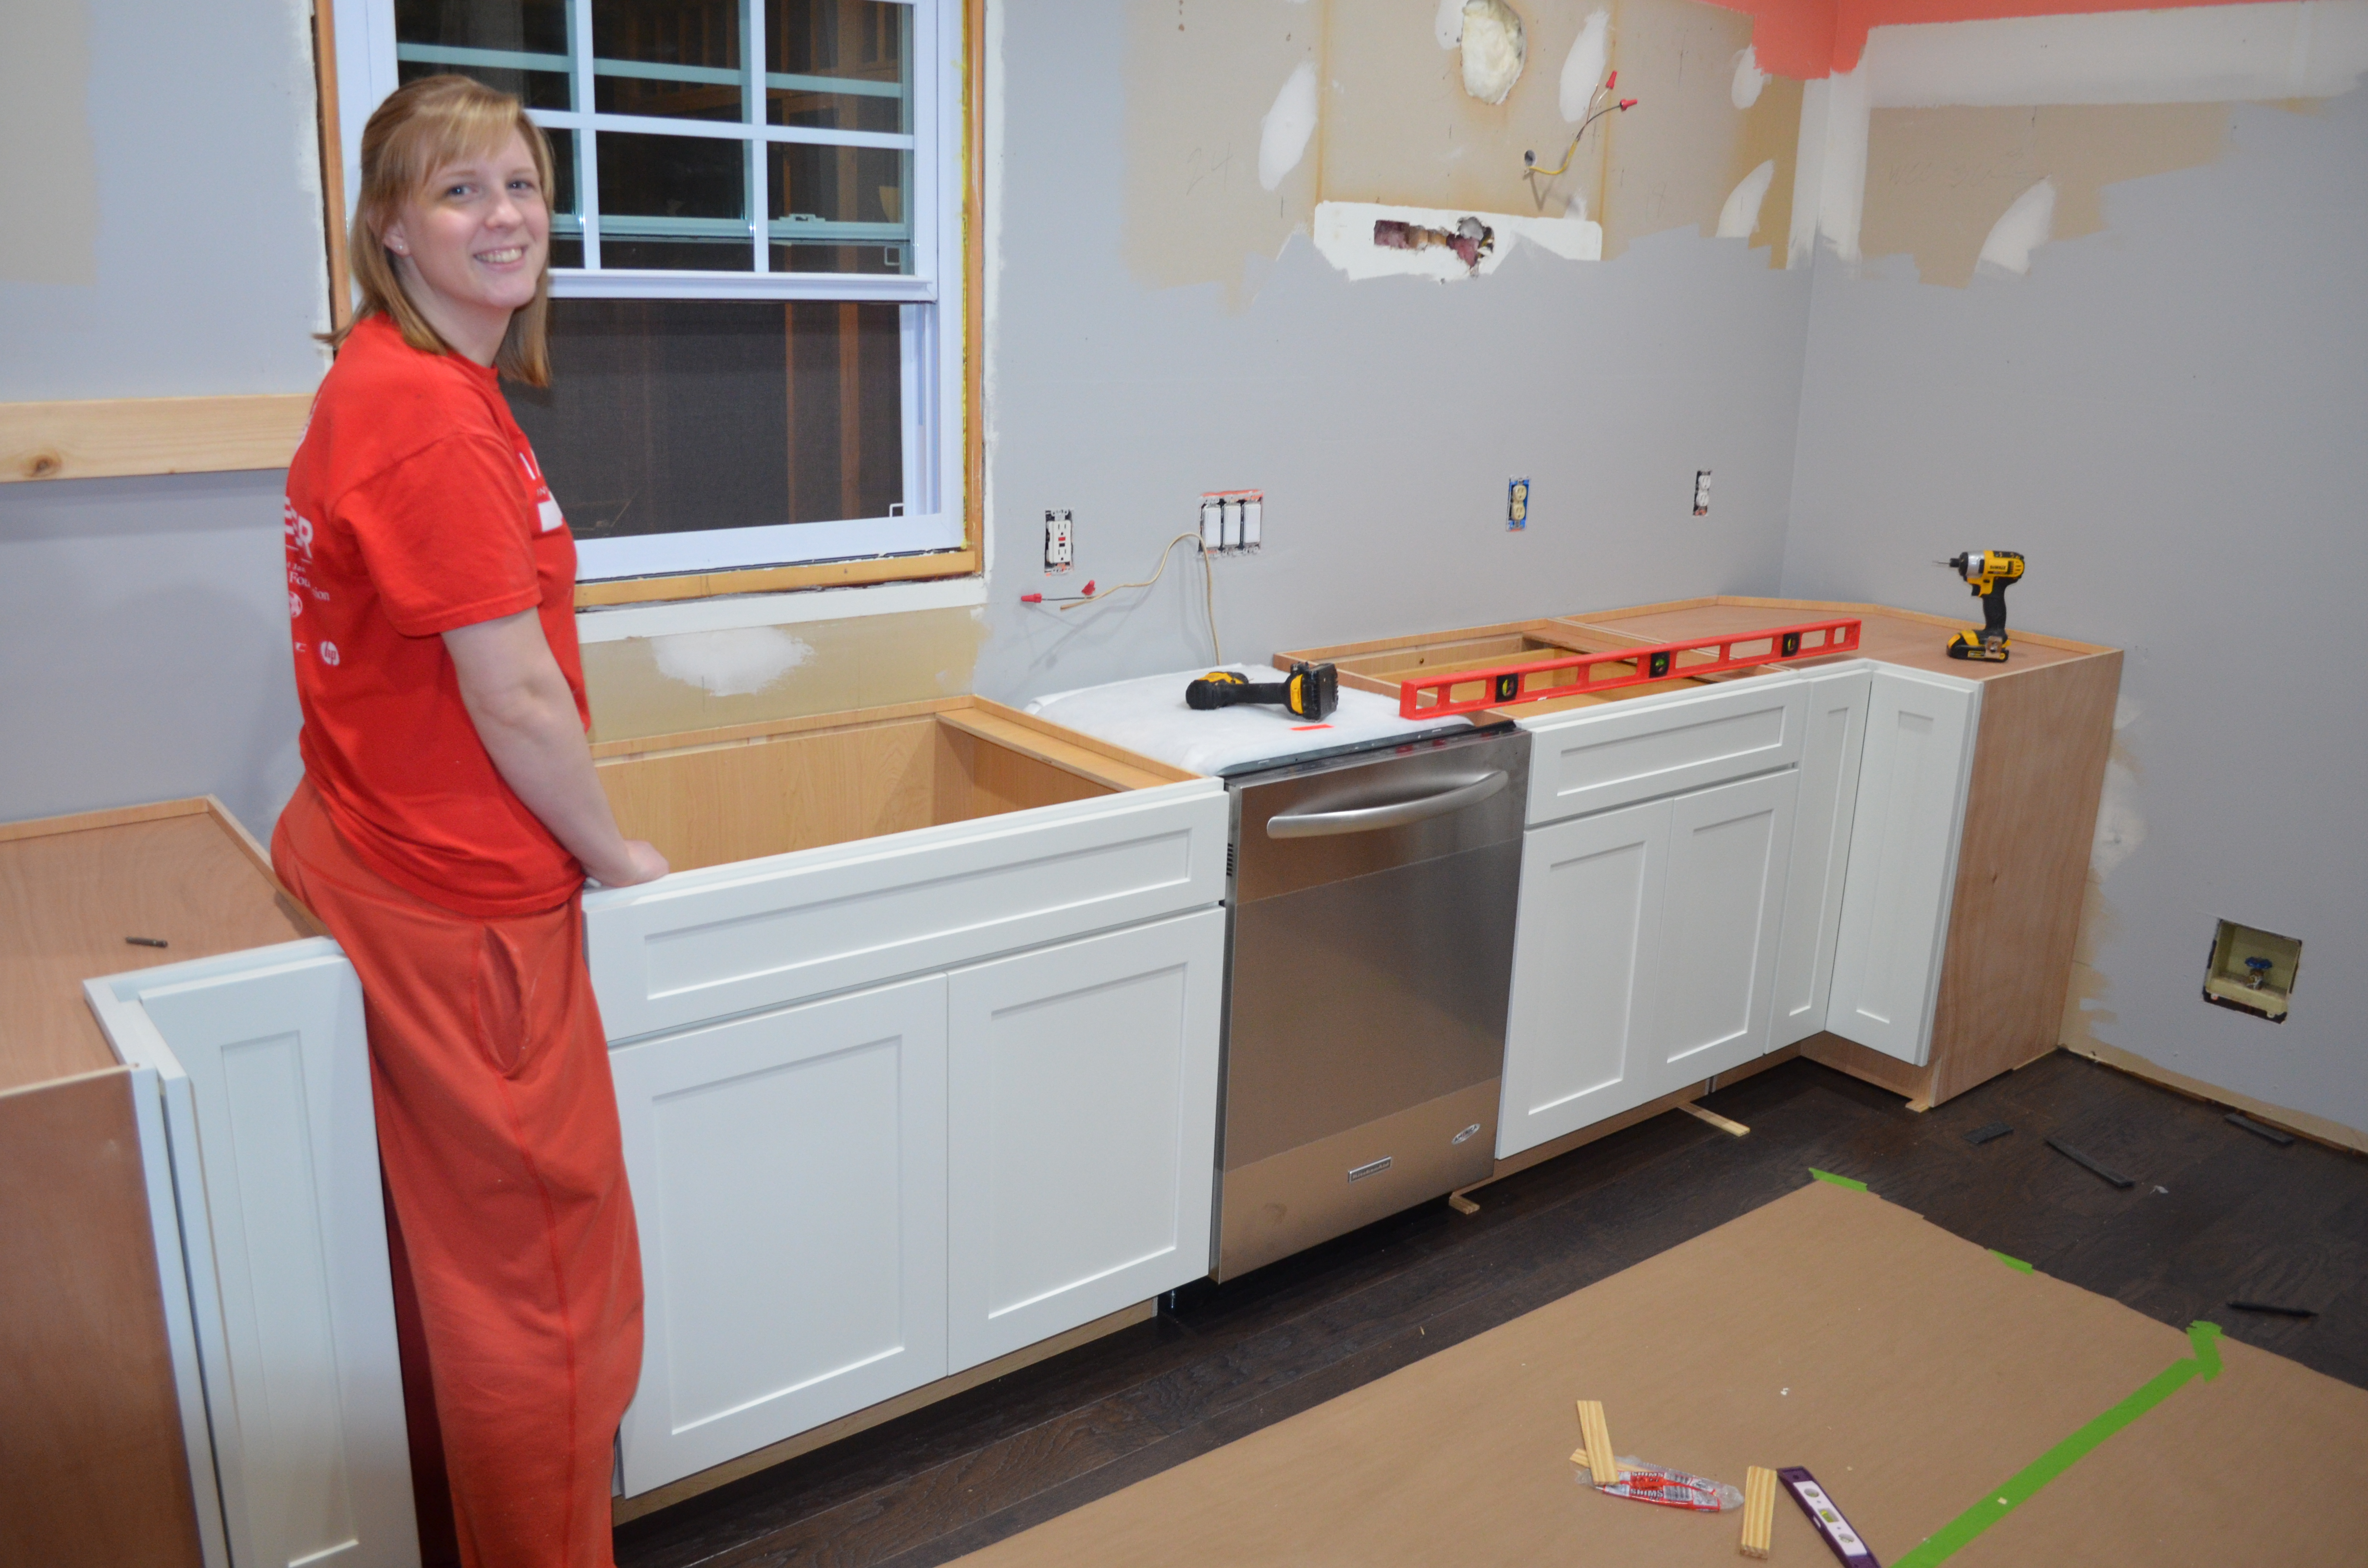 Countertop Dishwasher Good Guys : Kitchen Renovation, Part 1 - Scott and AshleyScott and Ashley